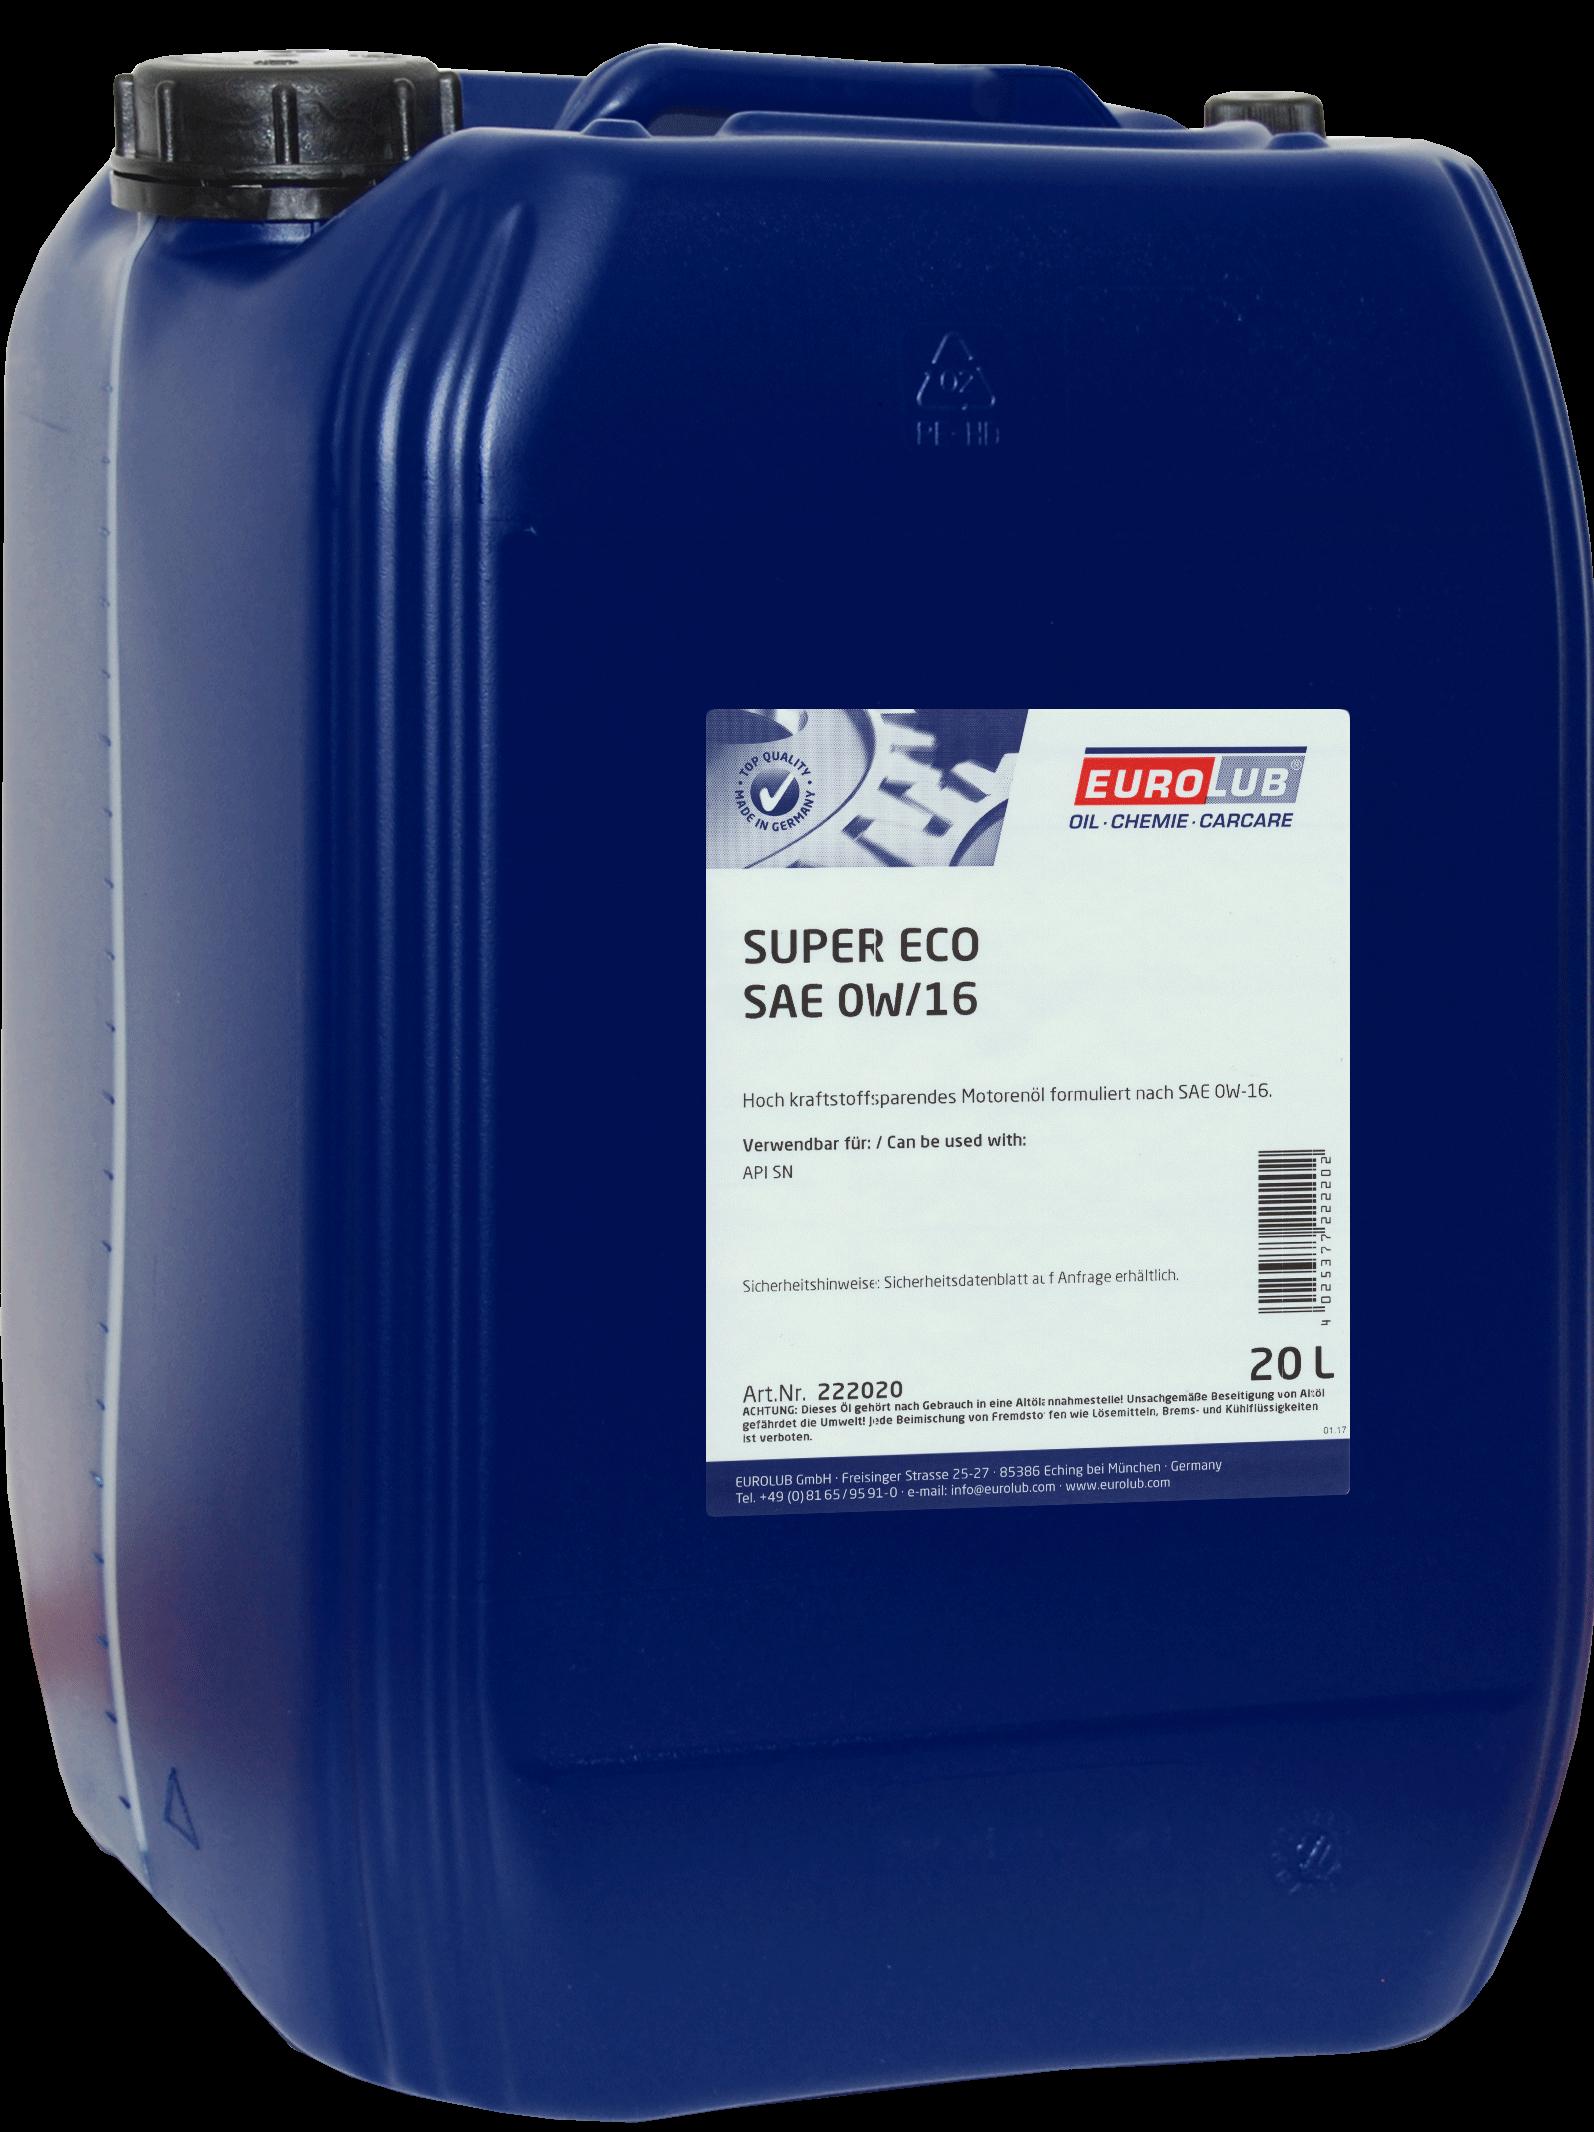 EUROLUB SUPER ECO SAE 0W/16 (синтетическое), 20л